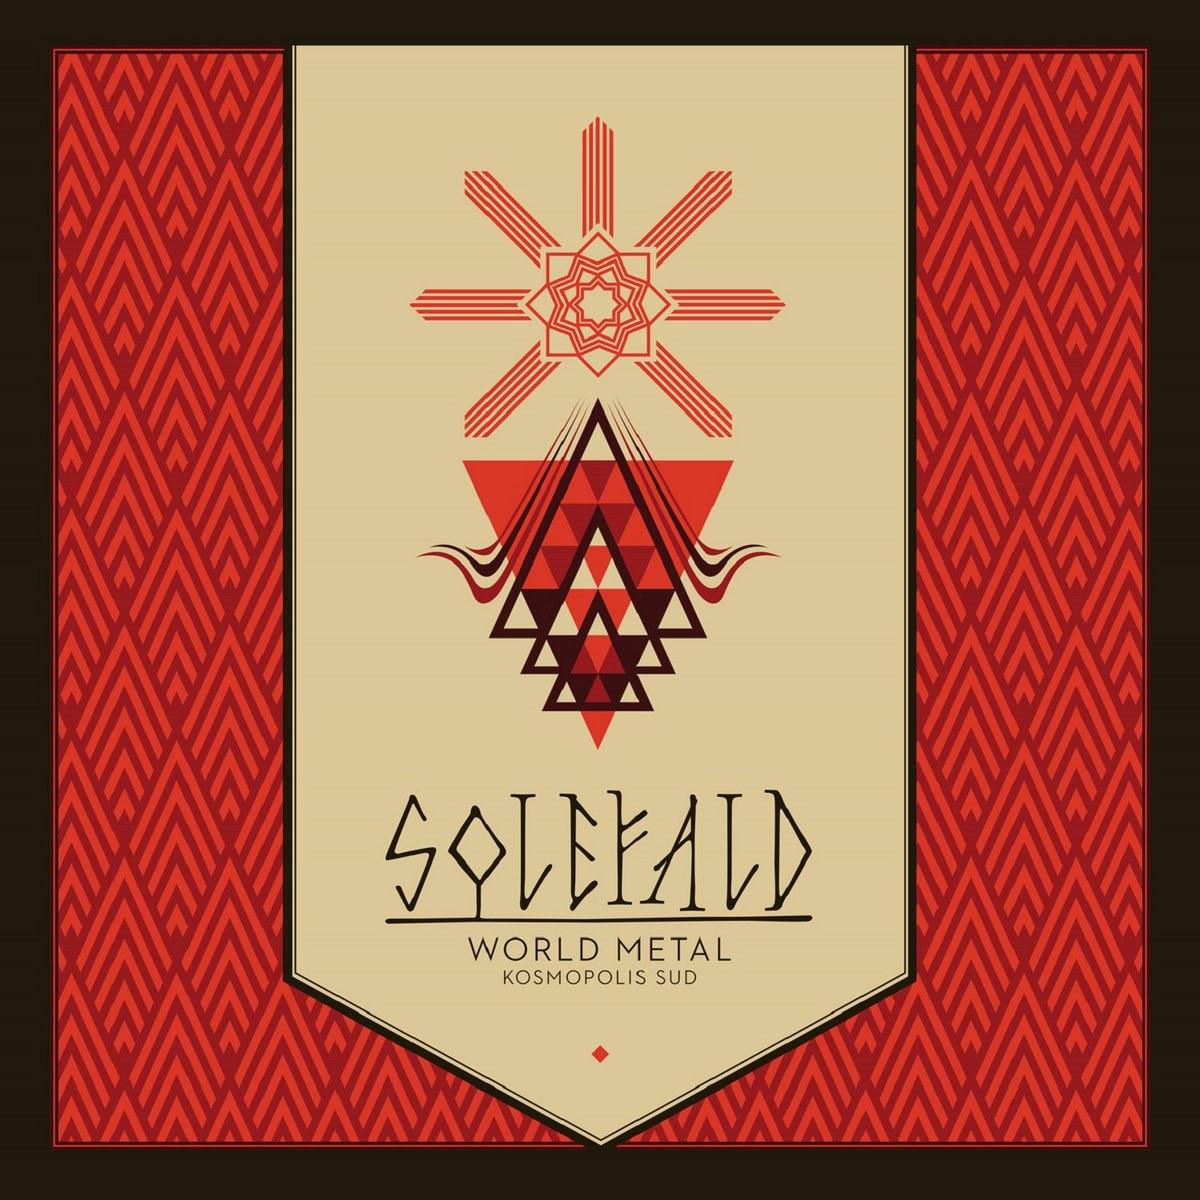 Reviews for Solefald - World Metal (Kosmopolis Sud)